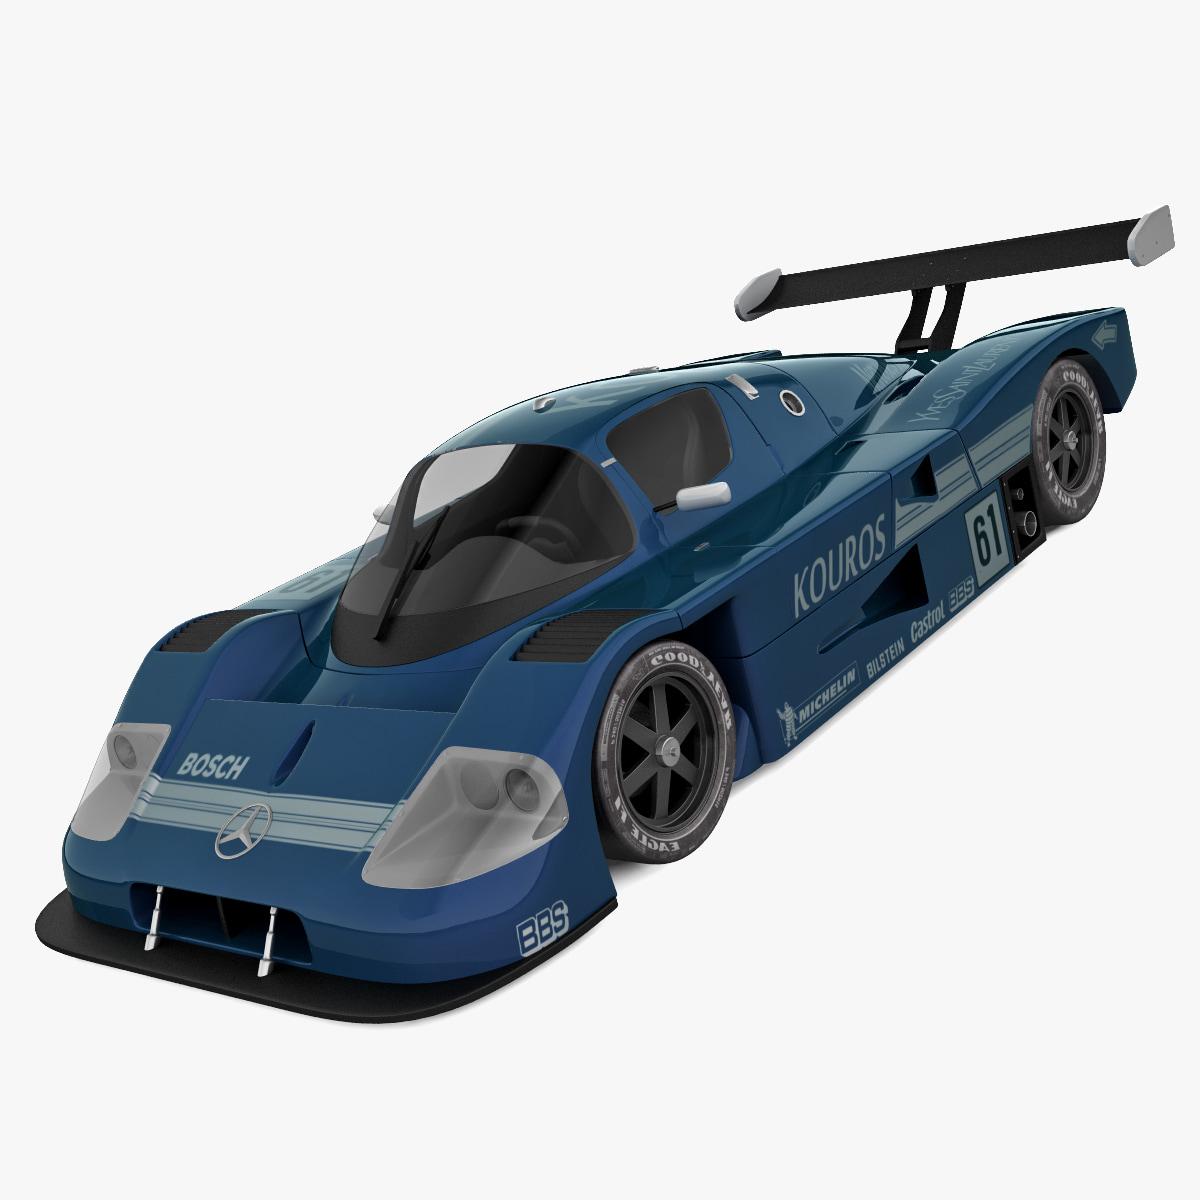 Mercedes_Sauber_C9_Blue_00.jpg